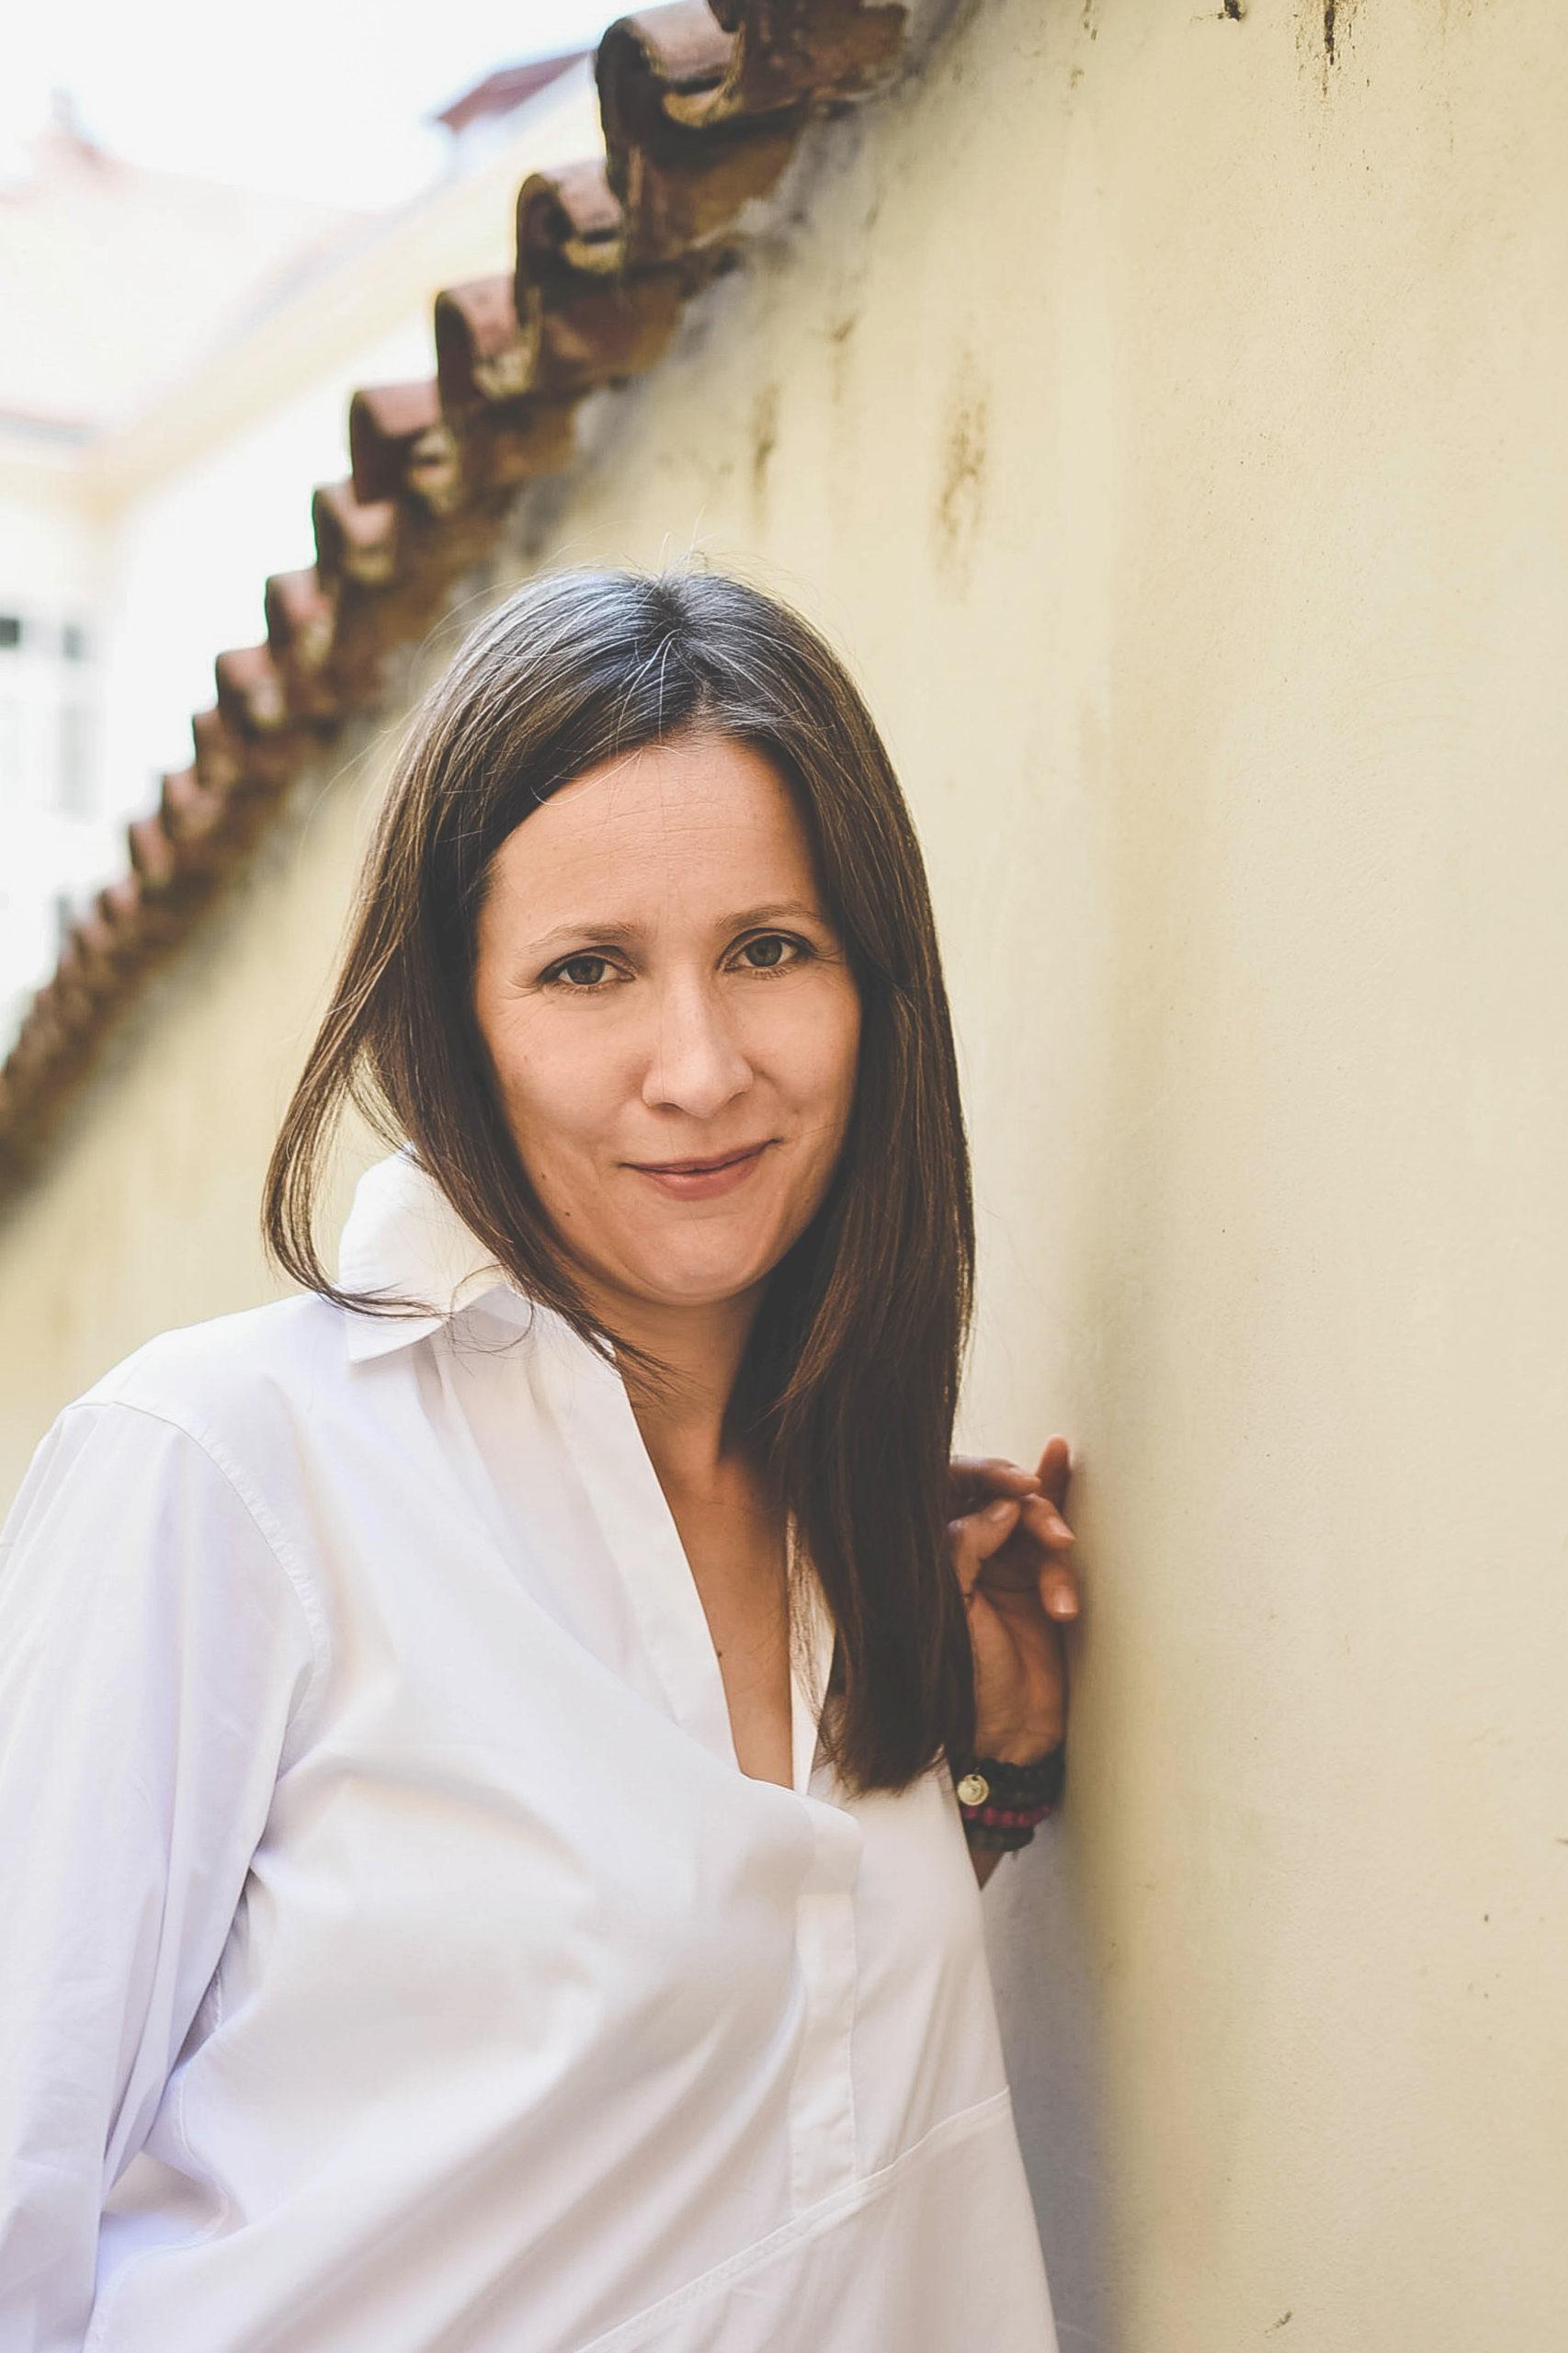 marta lenarczyk expat coach mentor facilitator relocation migration expatriate